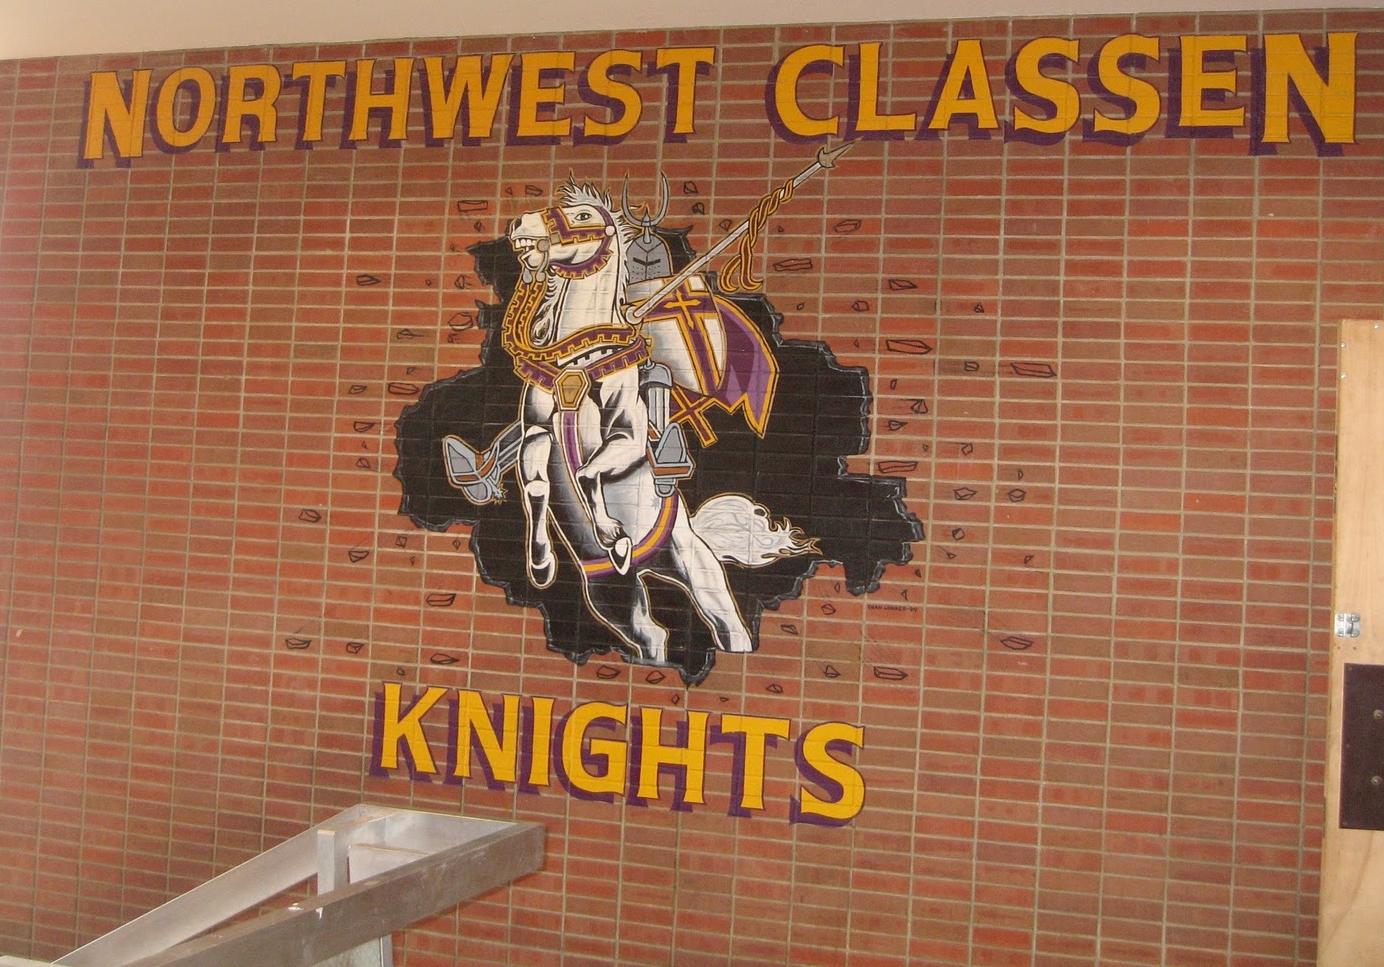 IMG_4336-Oklahoma+City,+Oklahoma+-+Northwest+Classen+Knights+(Mitch's+High+School,+Class+of+1965).jpg